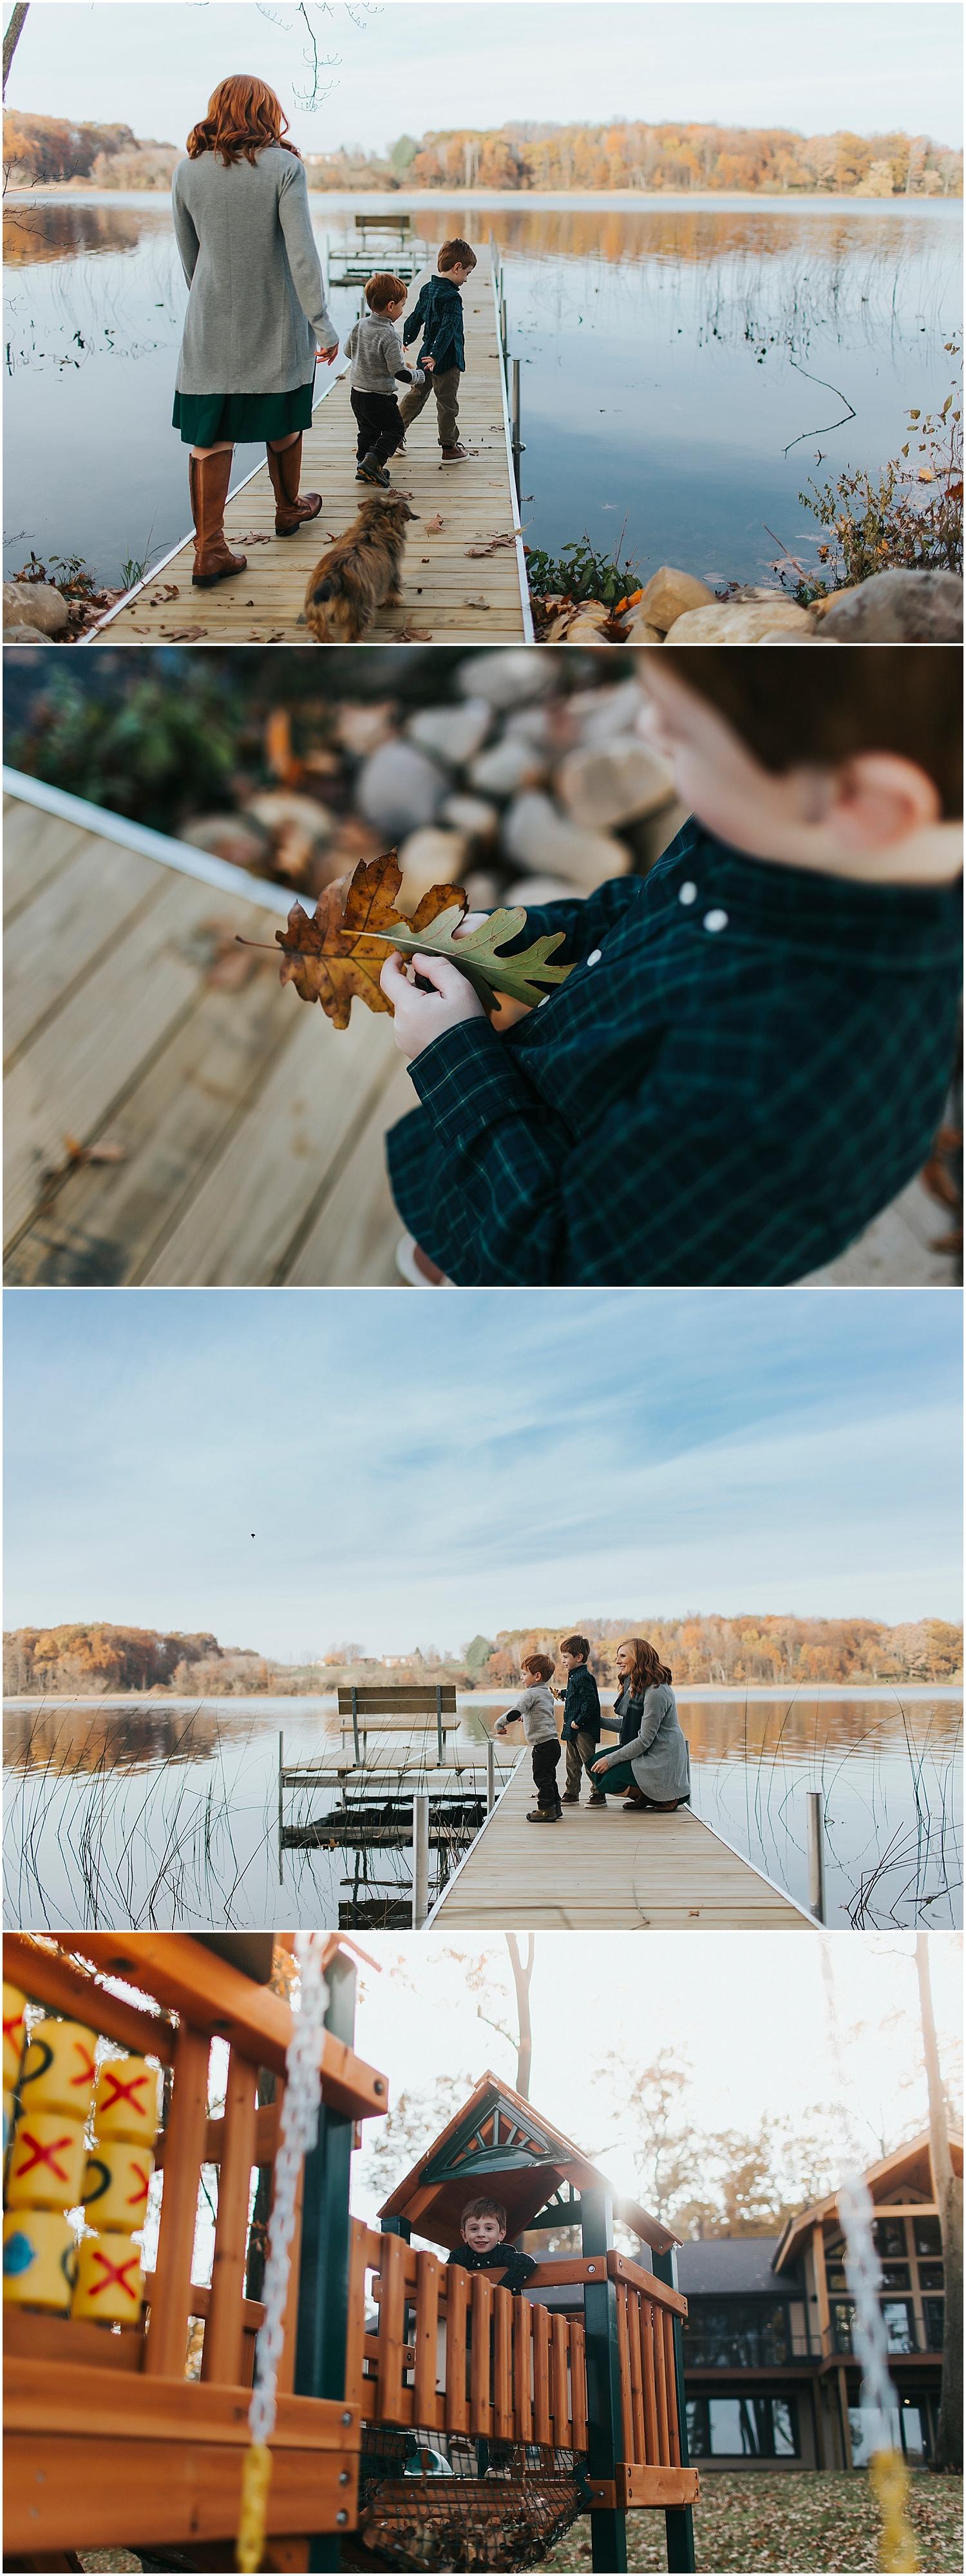 family photo session by lake in kalamazoo